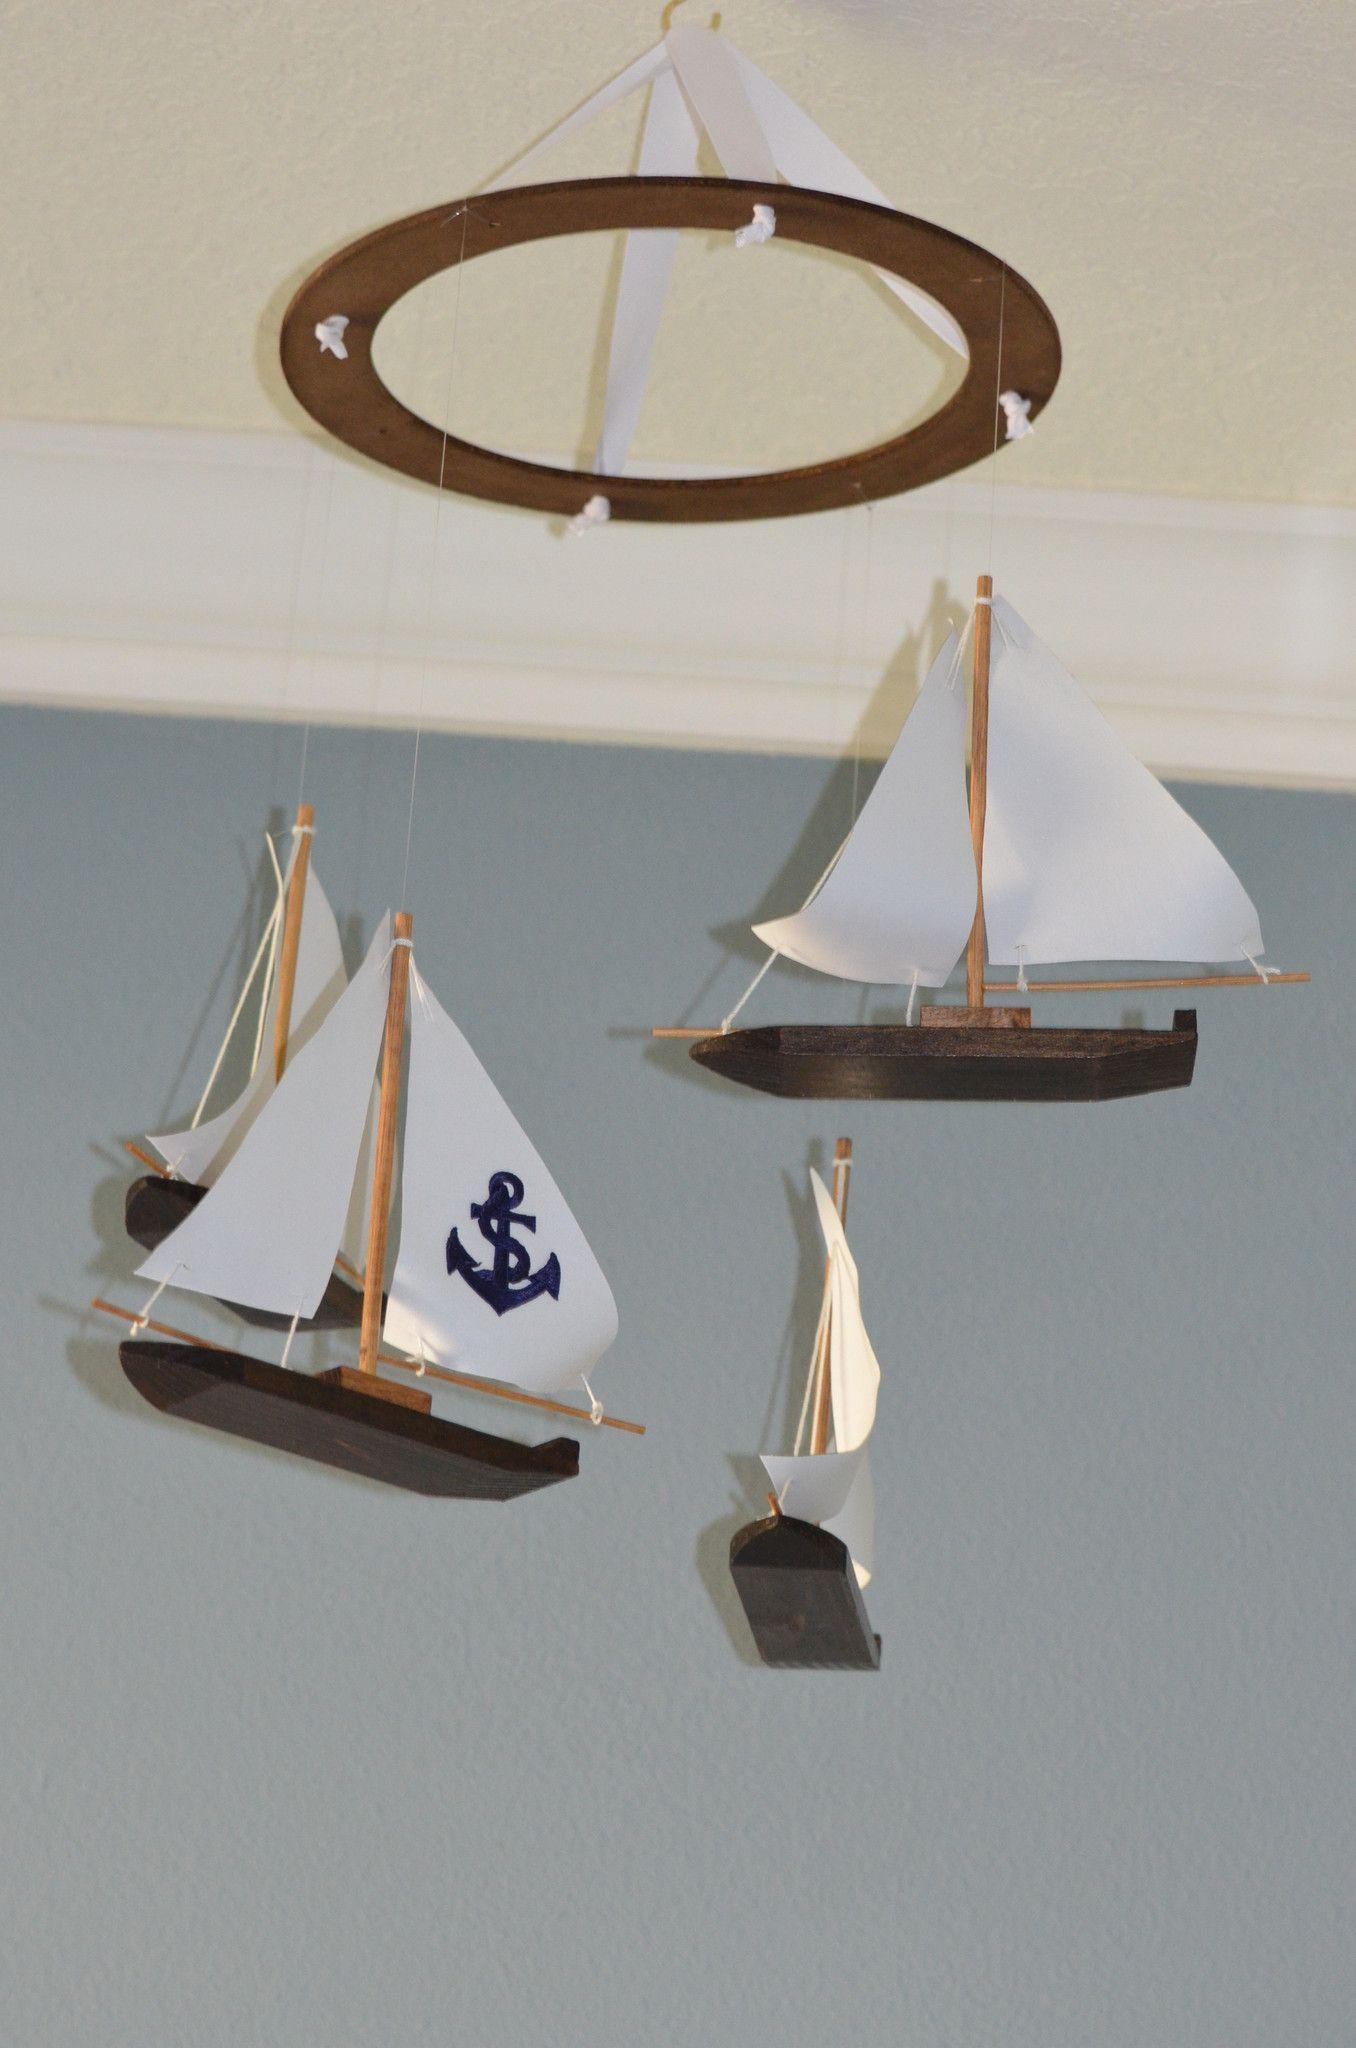 Baby Nash S Vintage Nautical Nursery: Sailboat Nautical Nursery Mobile